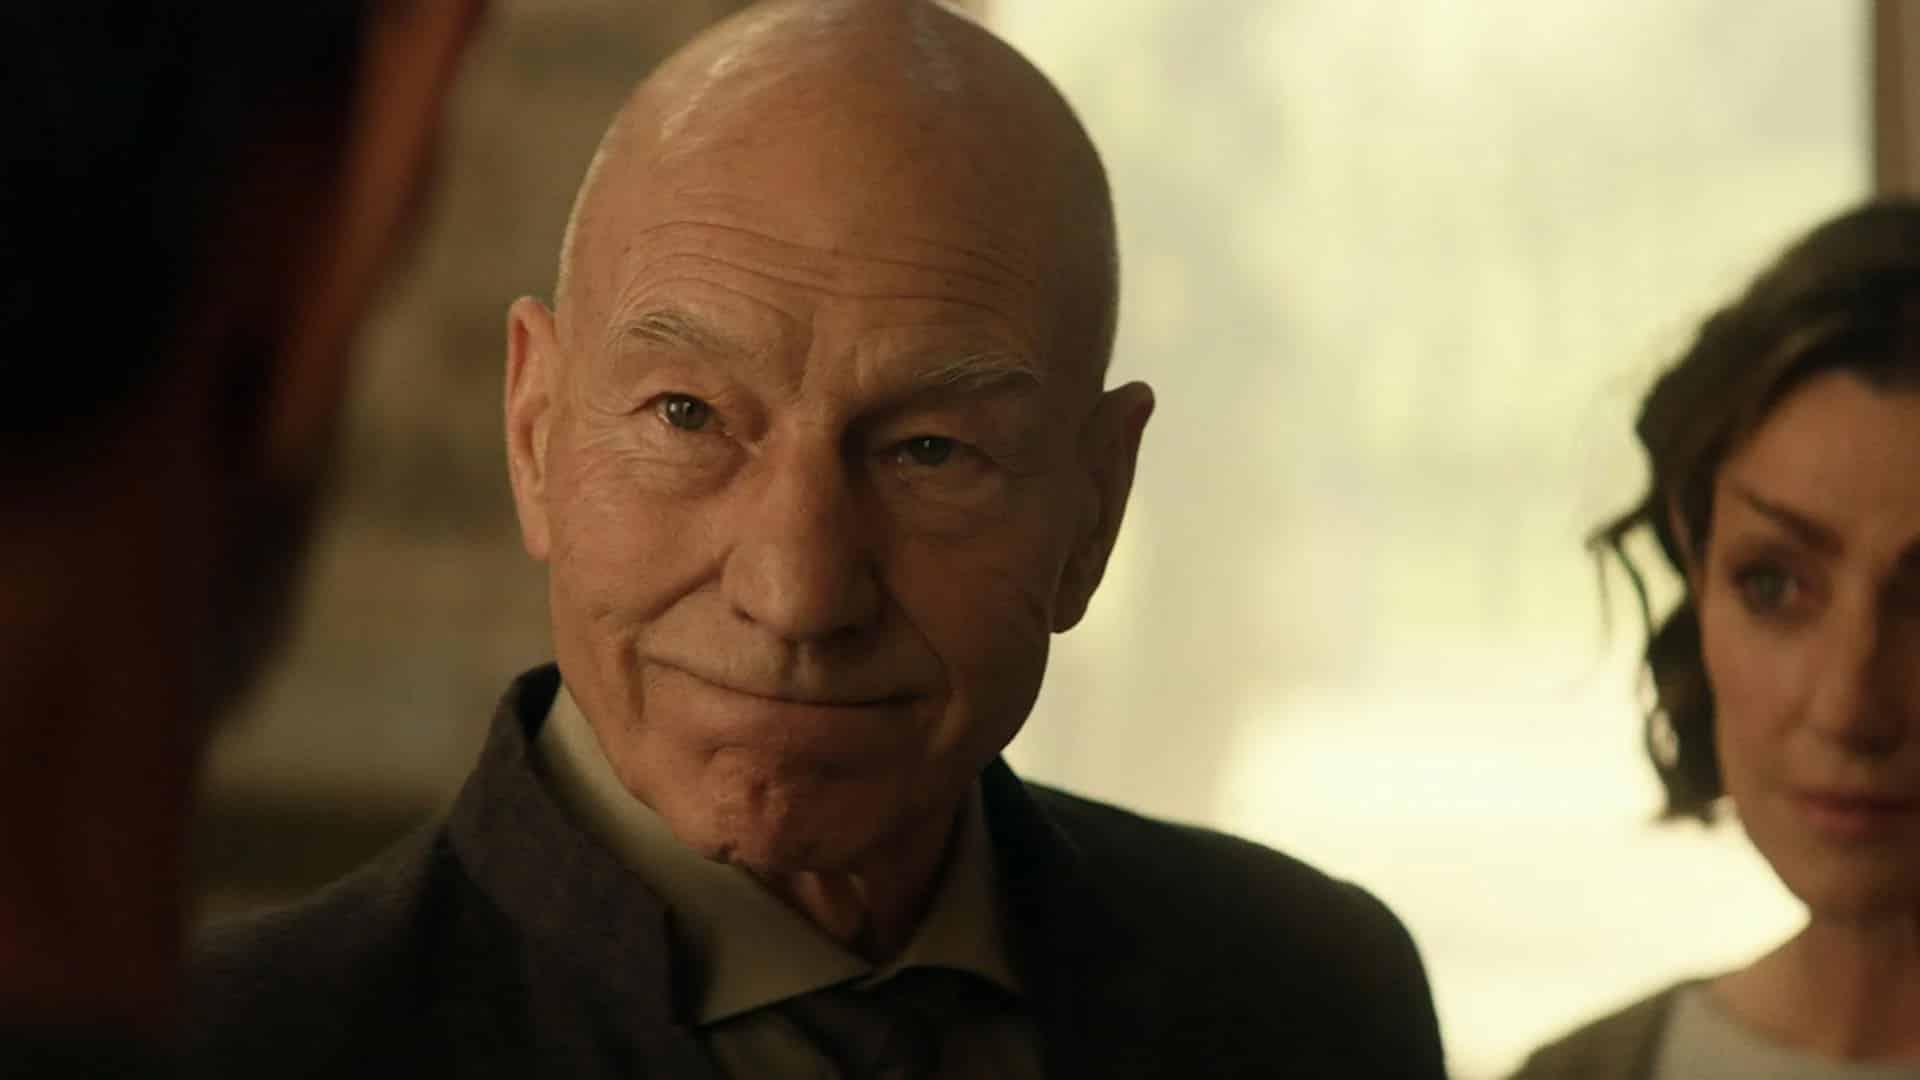 Star Trek: Picard fixes Star Trek Nemesis mistake